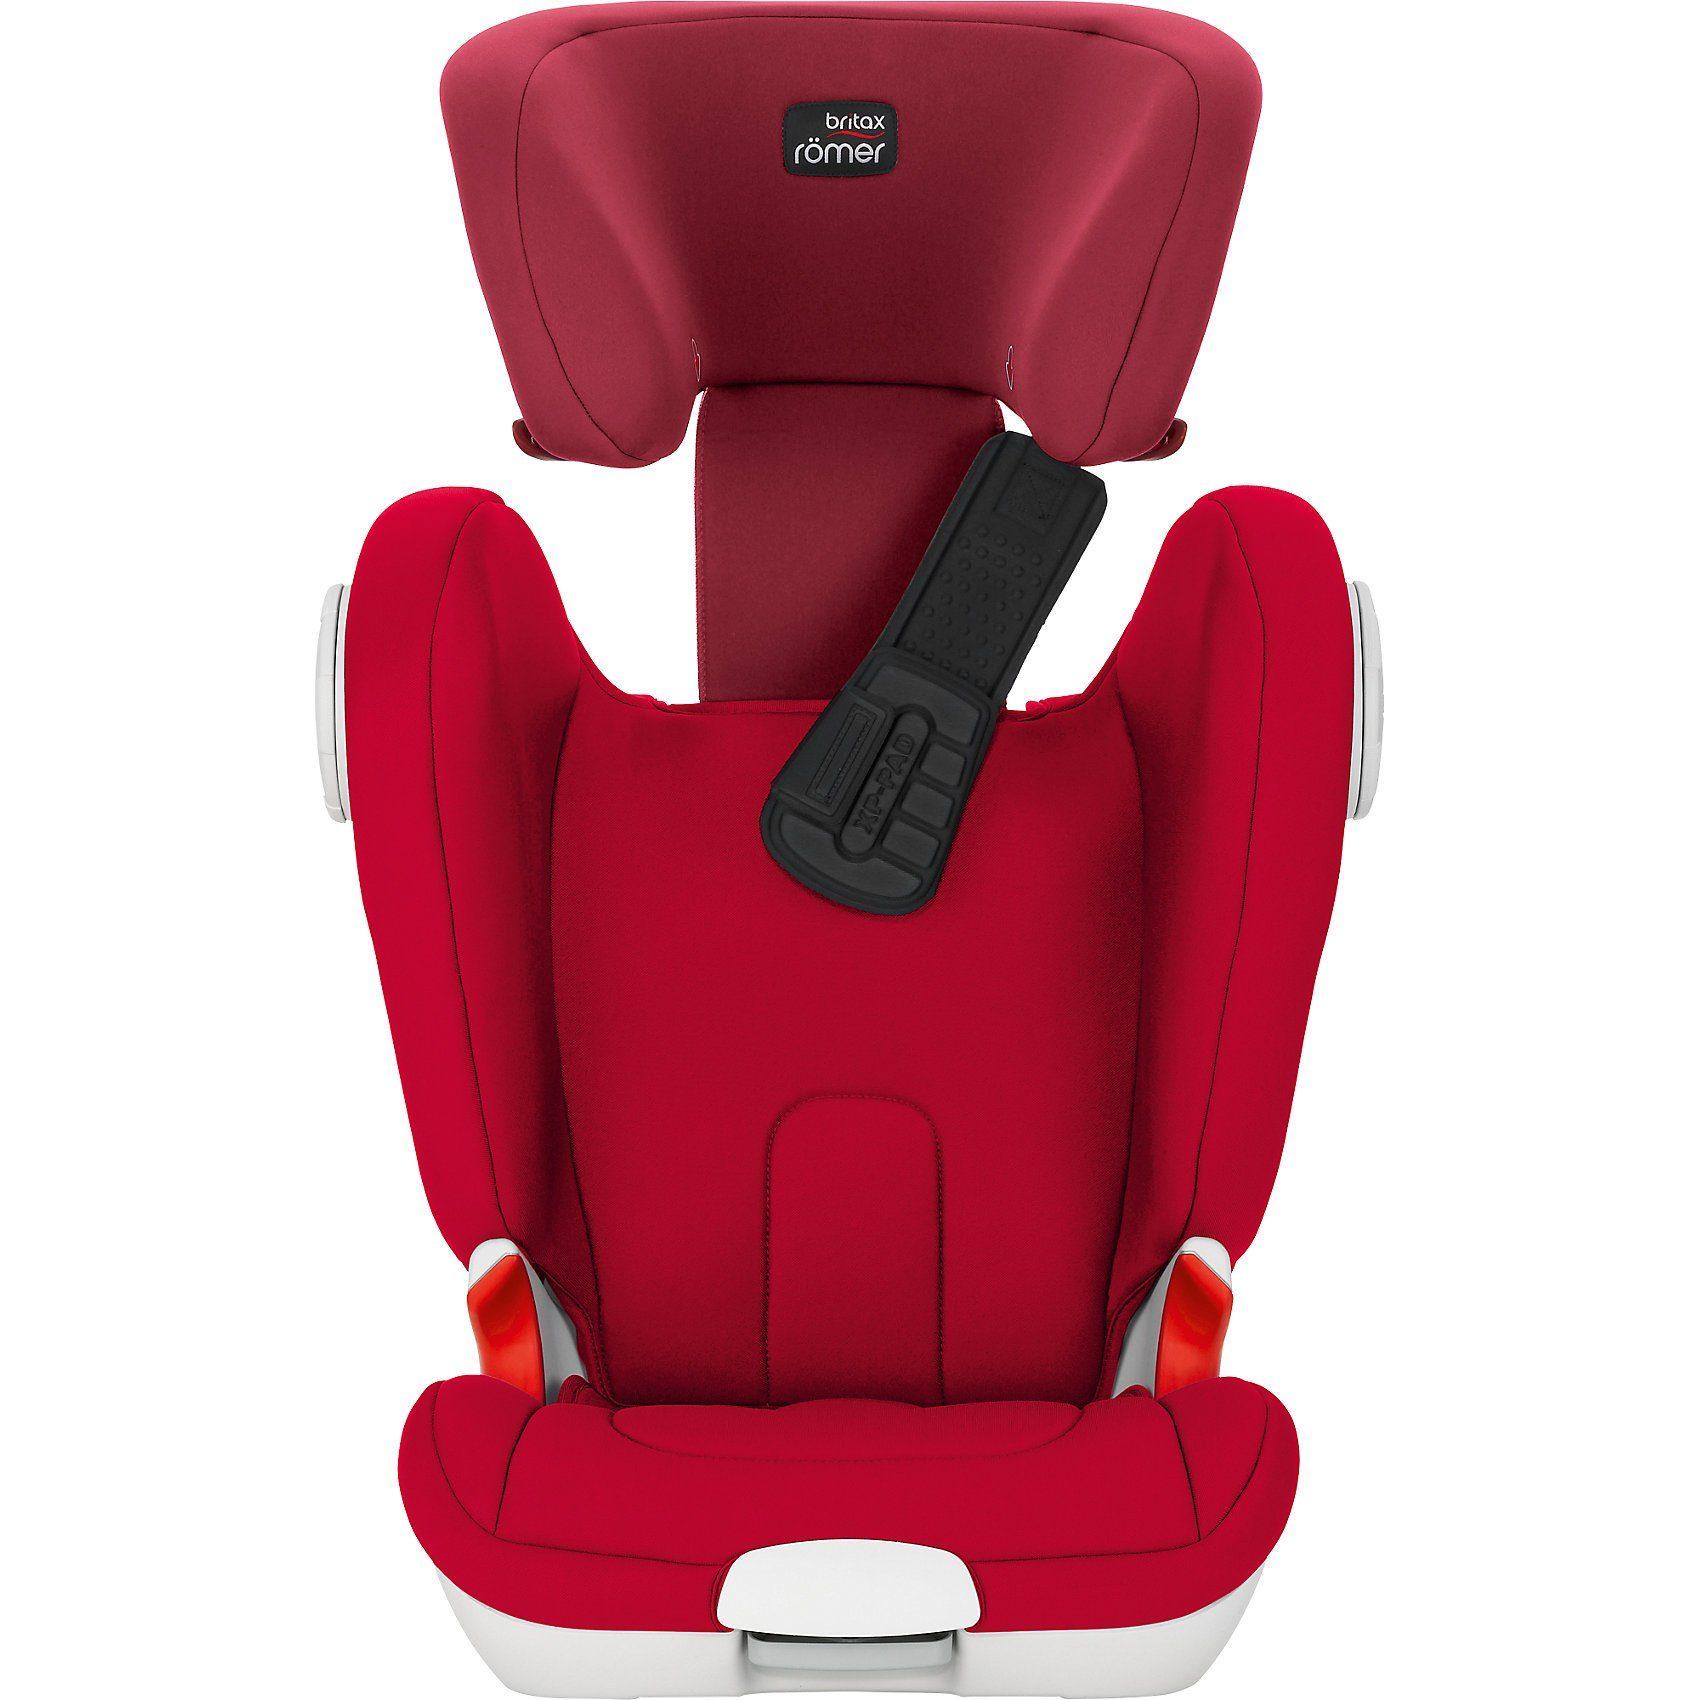 Britax Römer Auto-Kindersitz Kidfix XP Sict, Flame Red, 2016